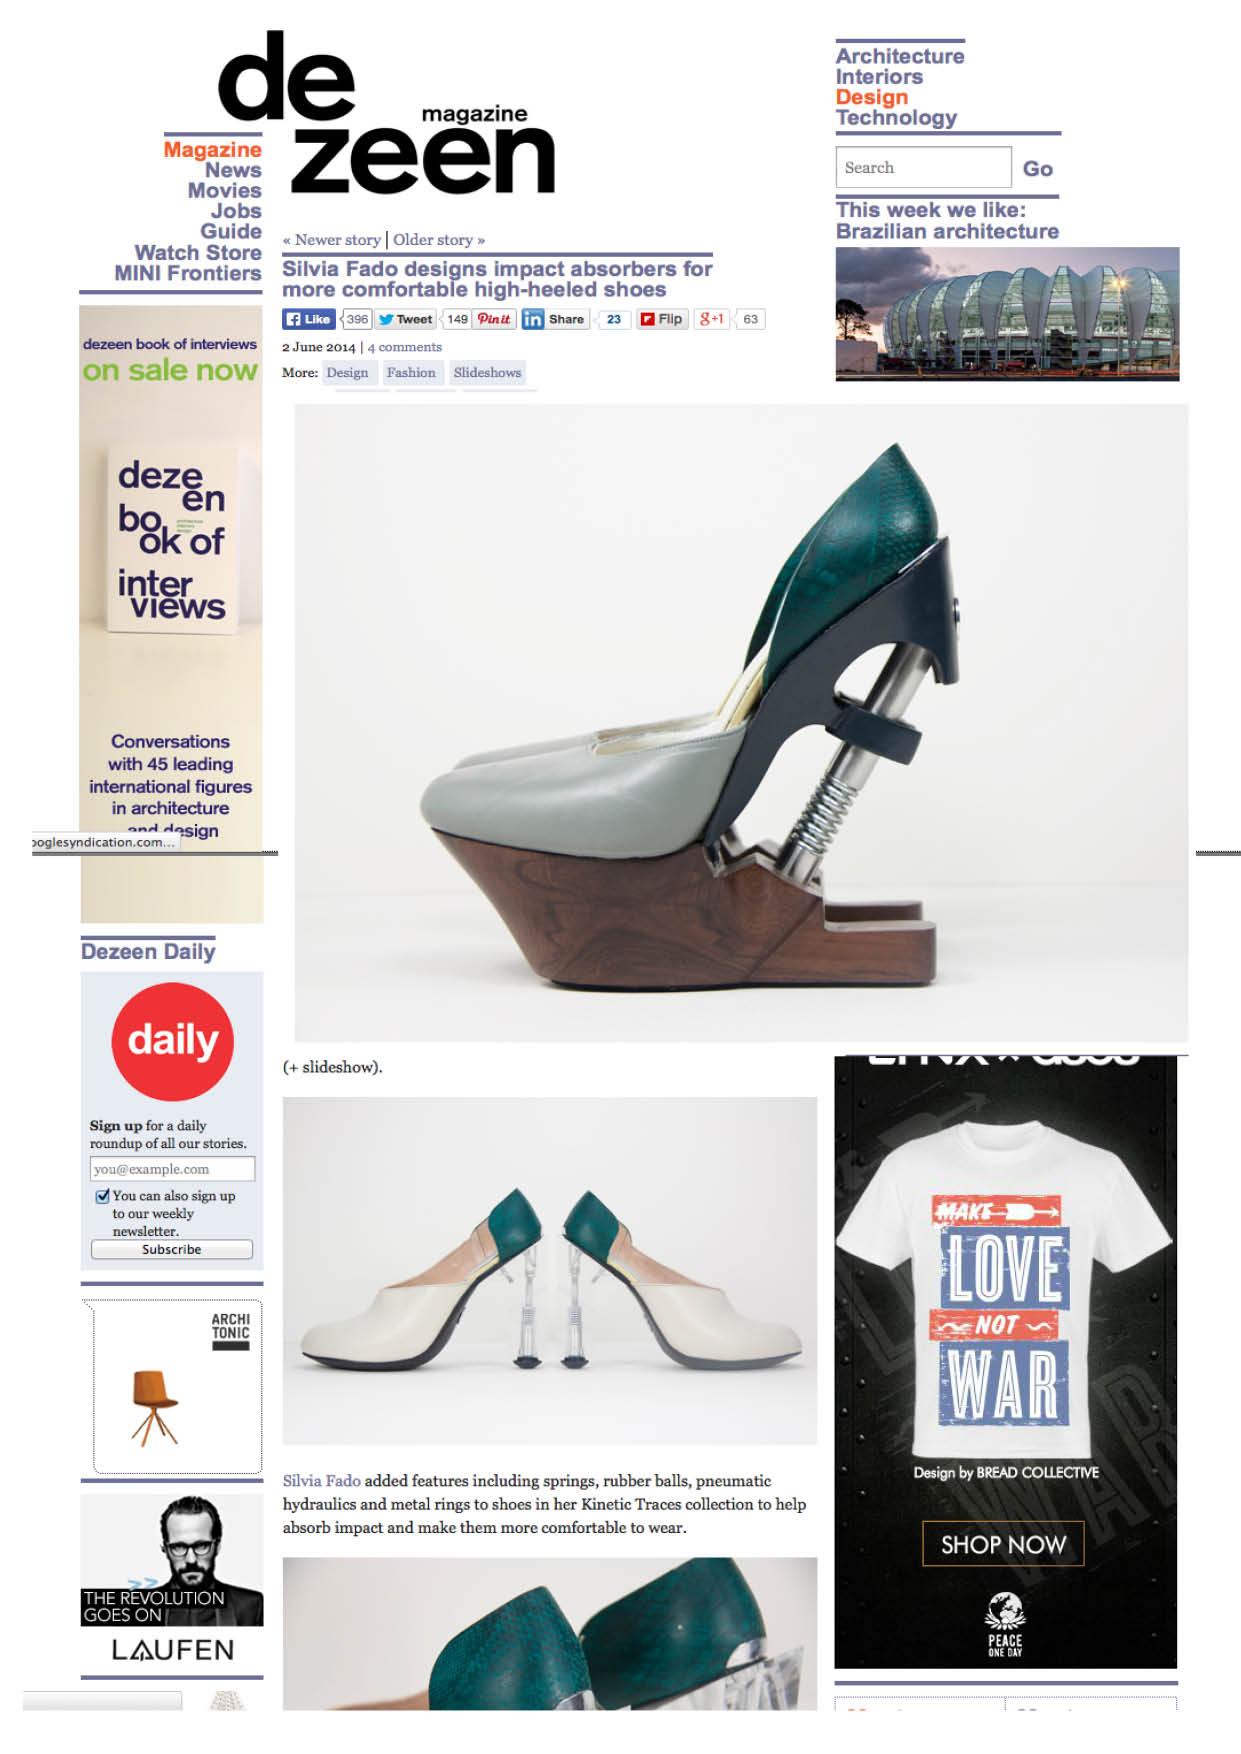 http://www.dezeen.com/2014/06/02/silvia-fado-high-heeled-shoes-impact-absorbers/